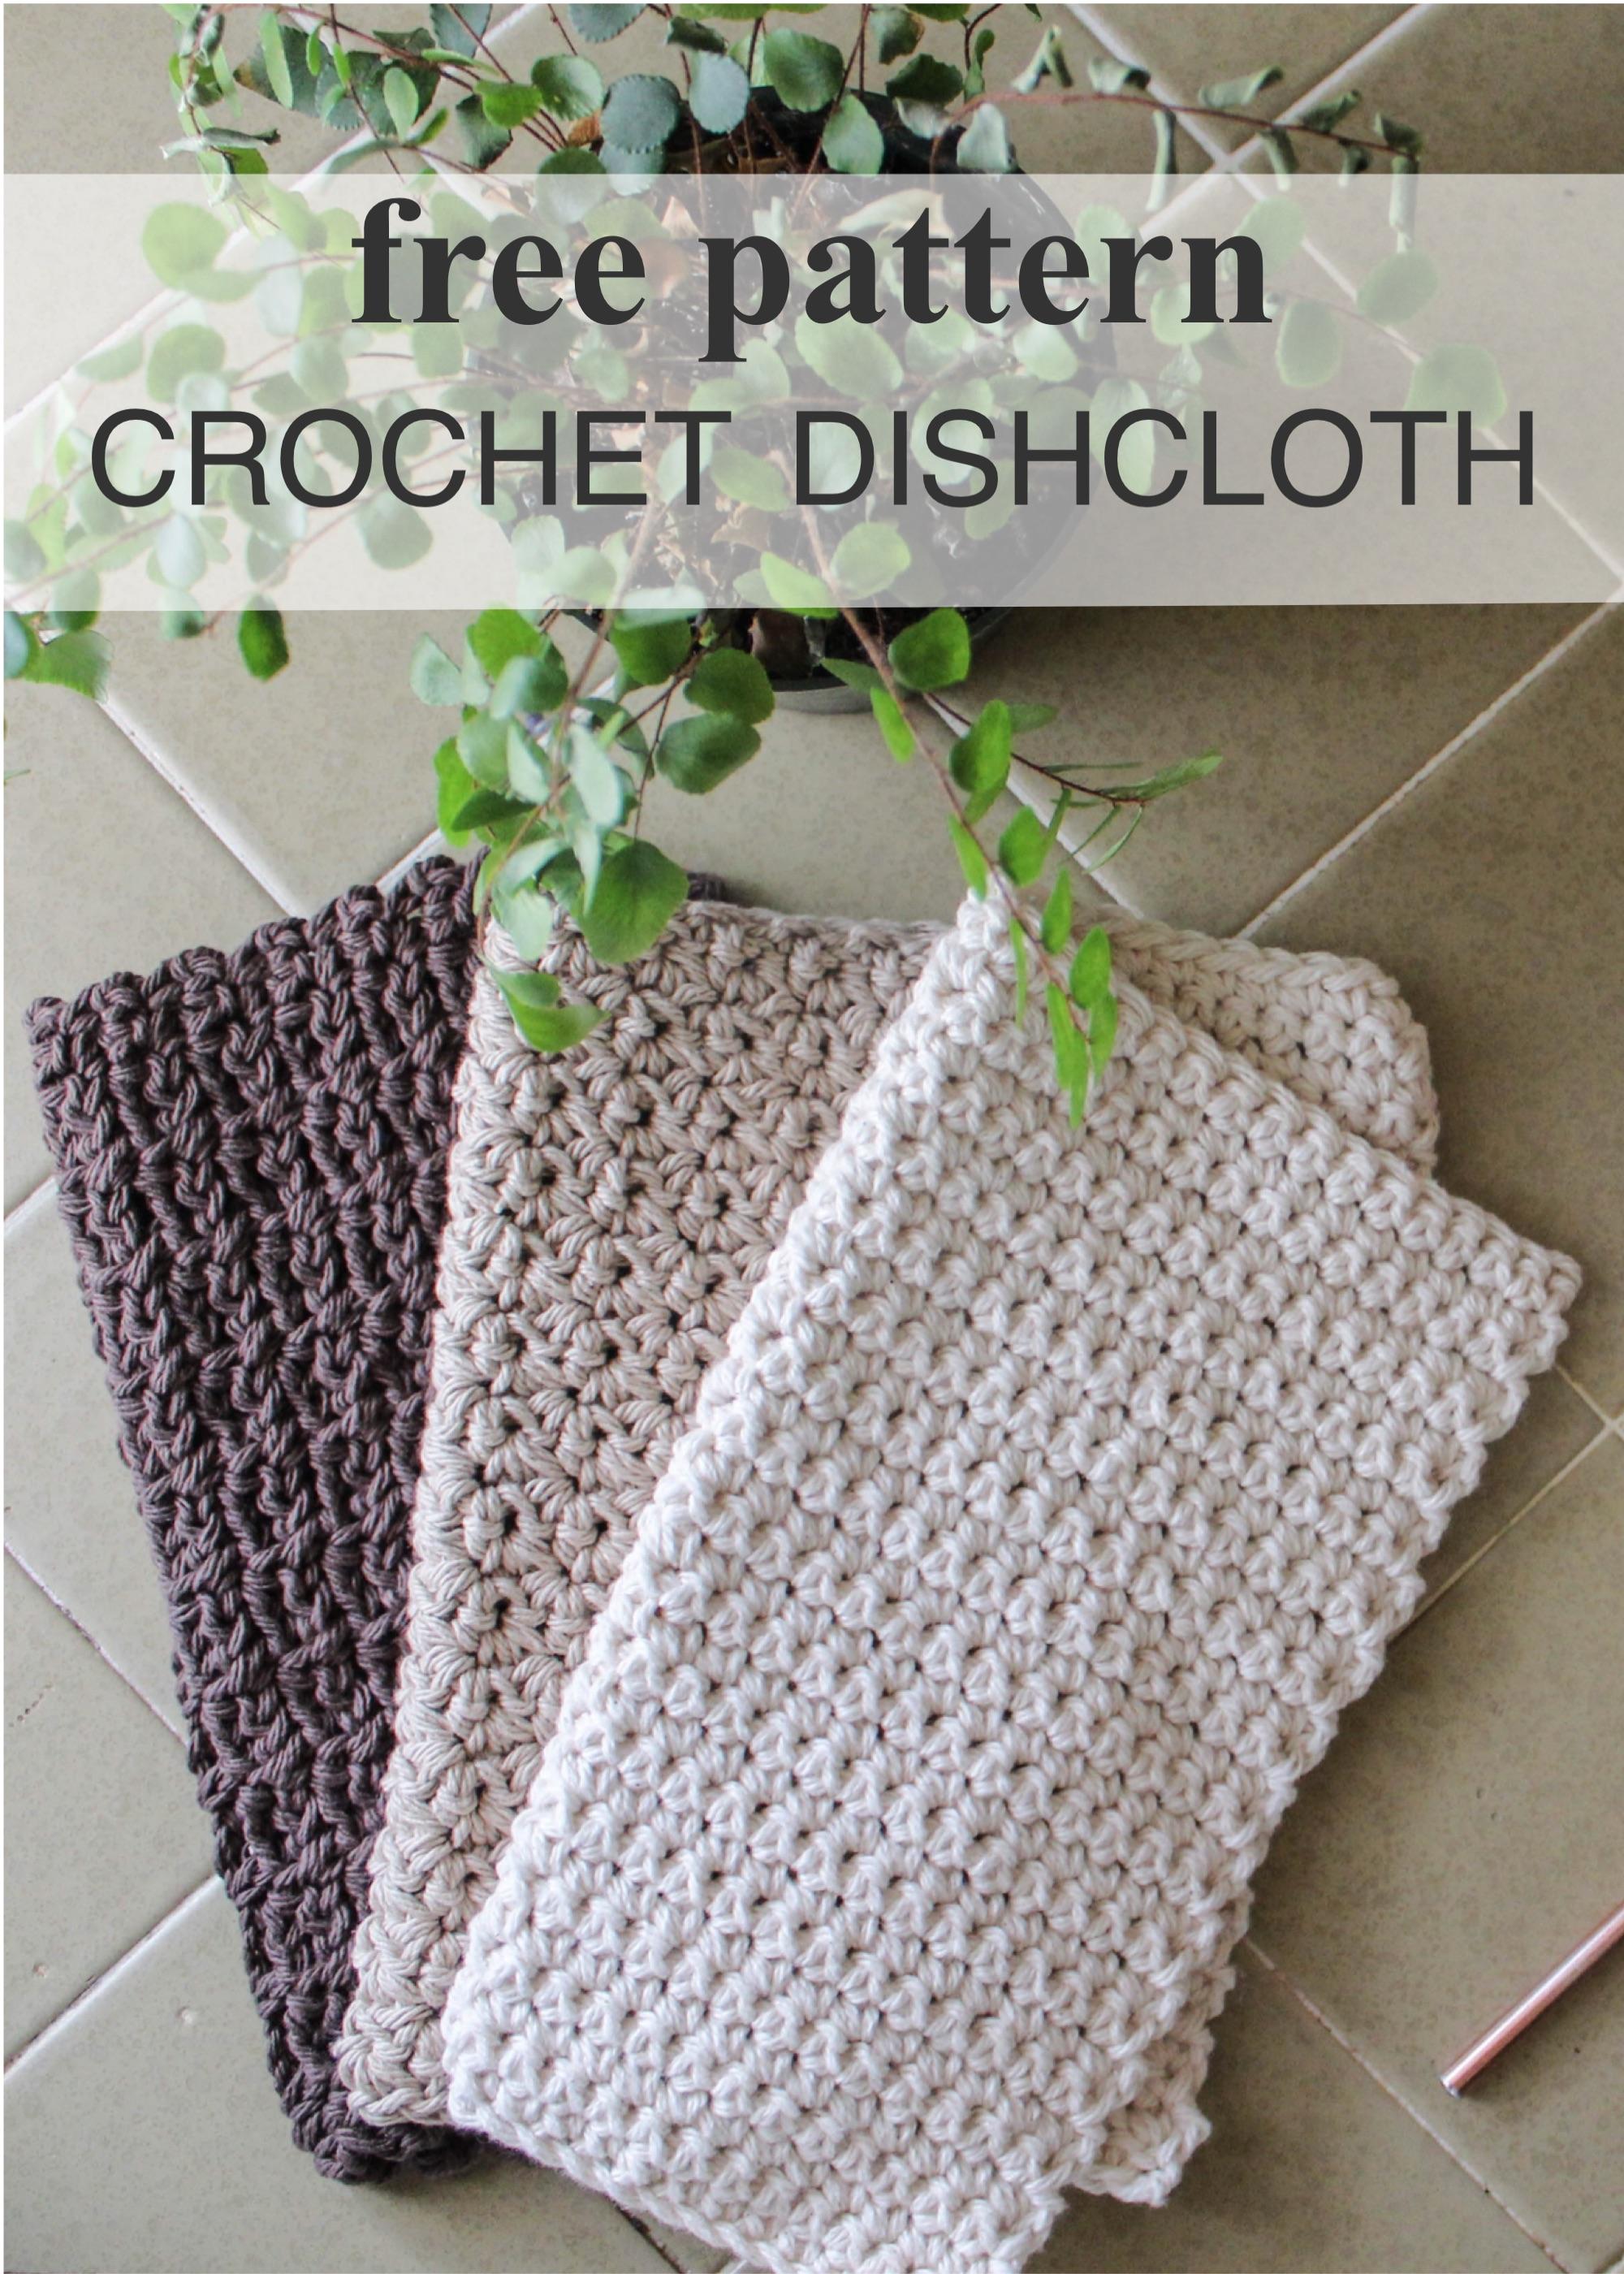 Free Crochet Dishcloth Pattern for Beginners by BlueCorduroy.com